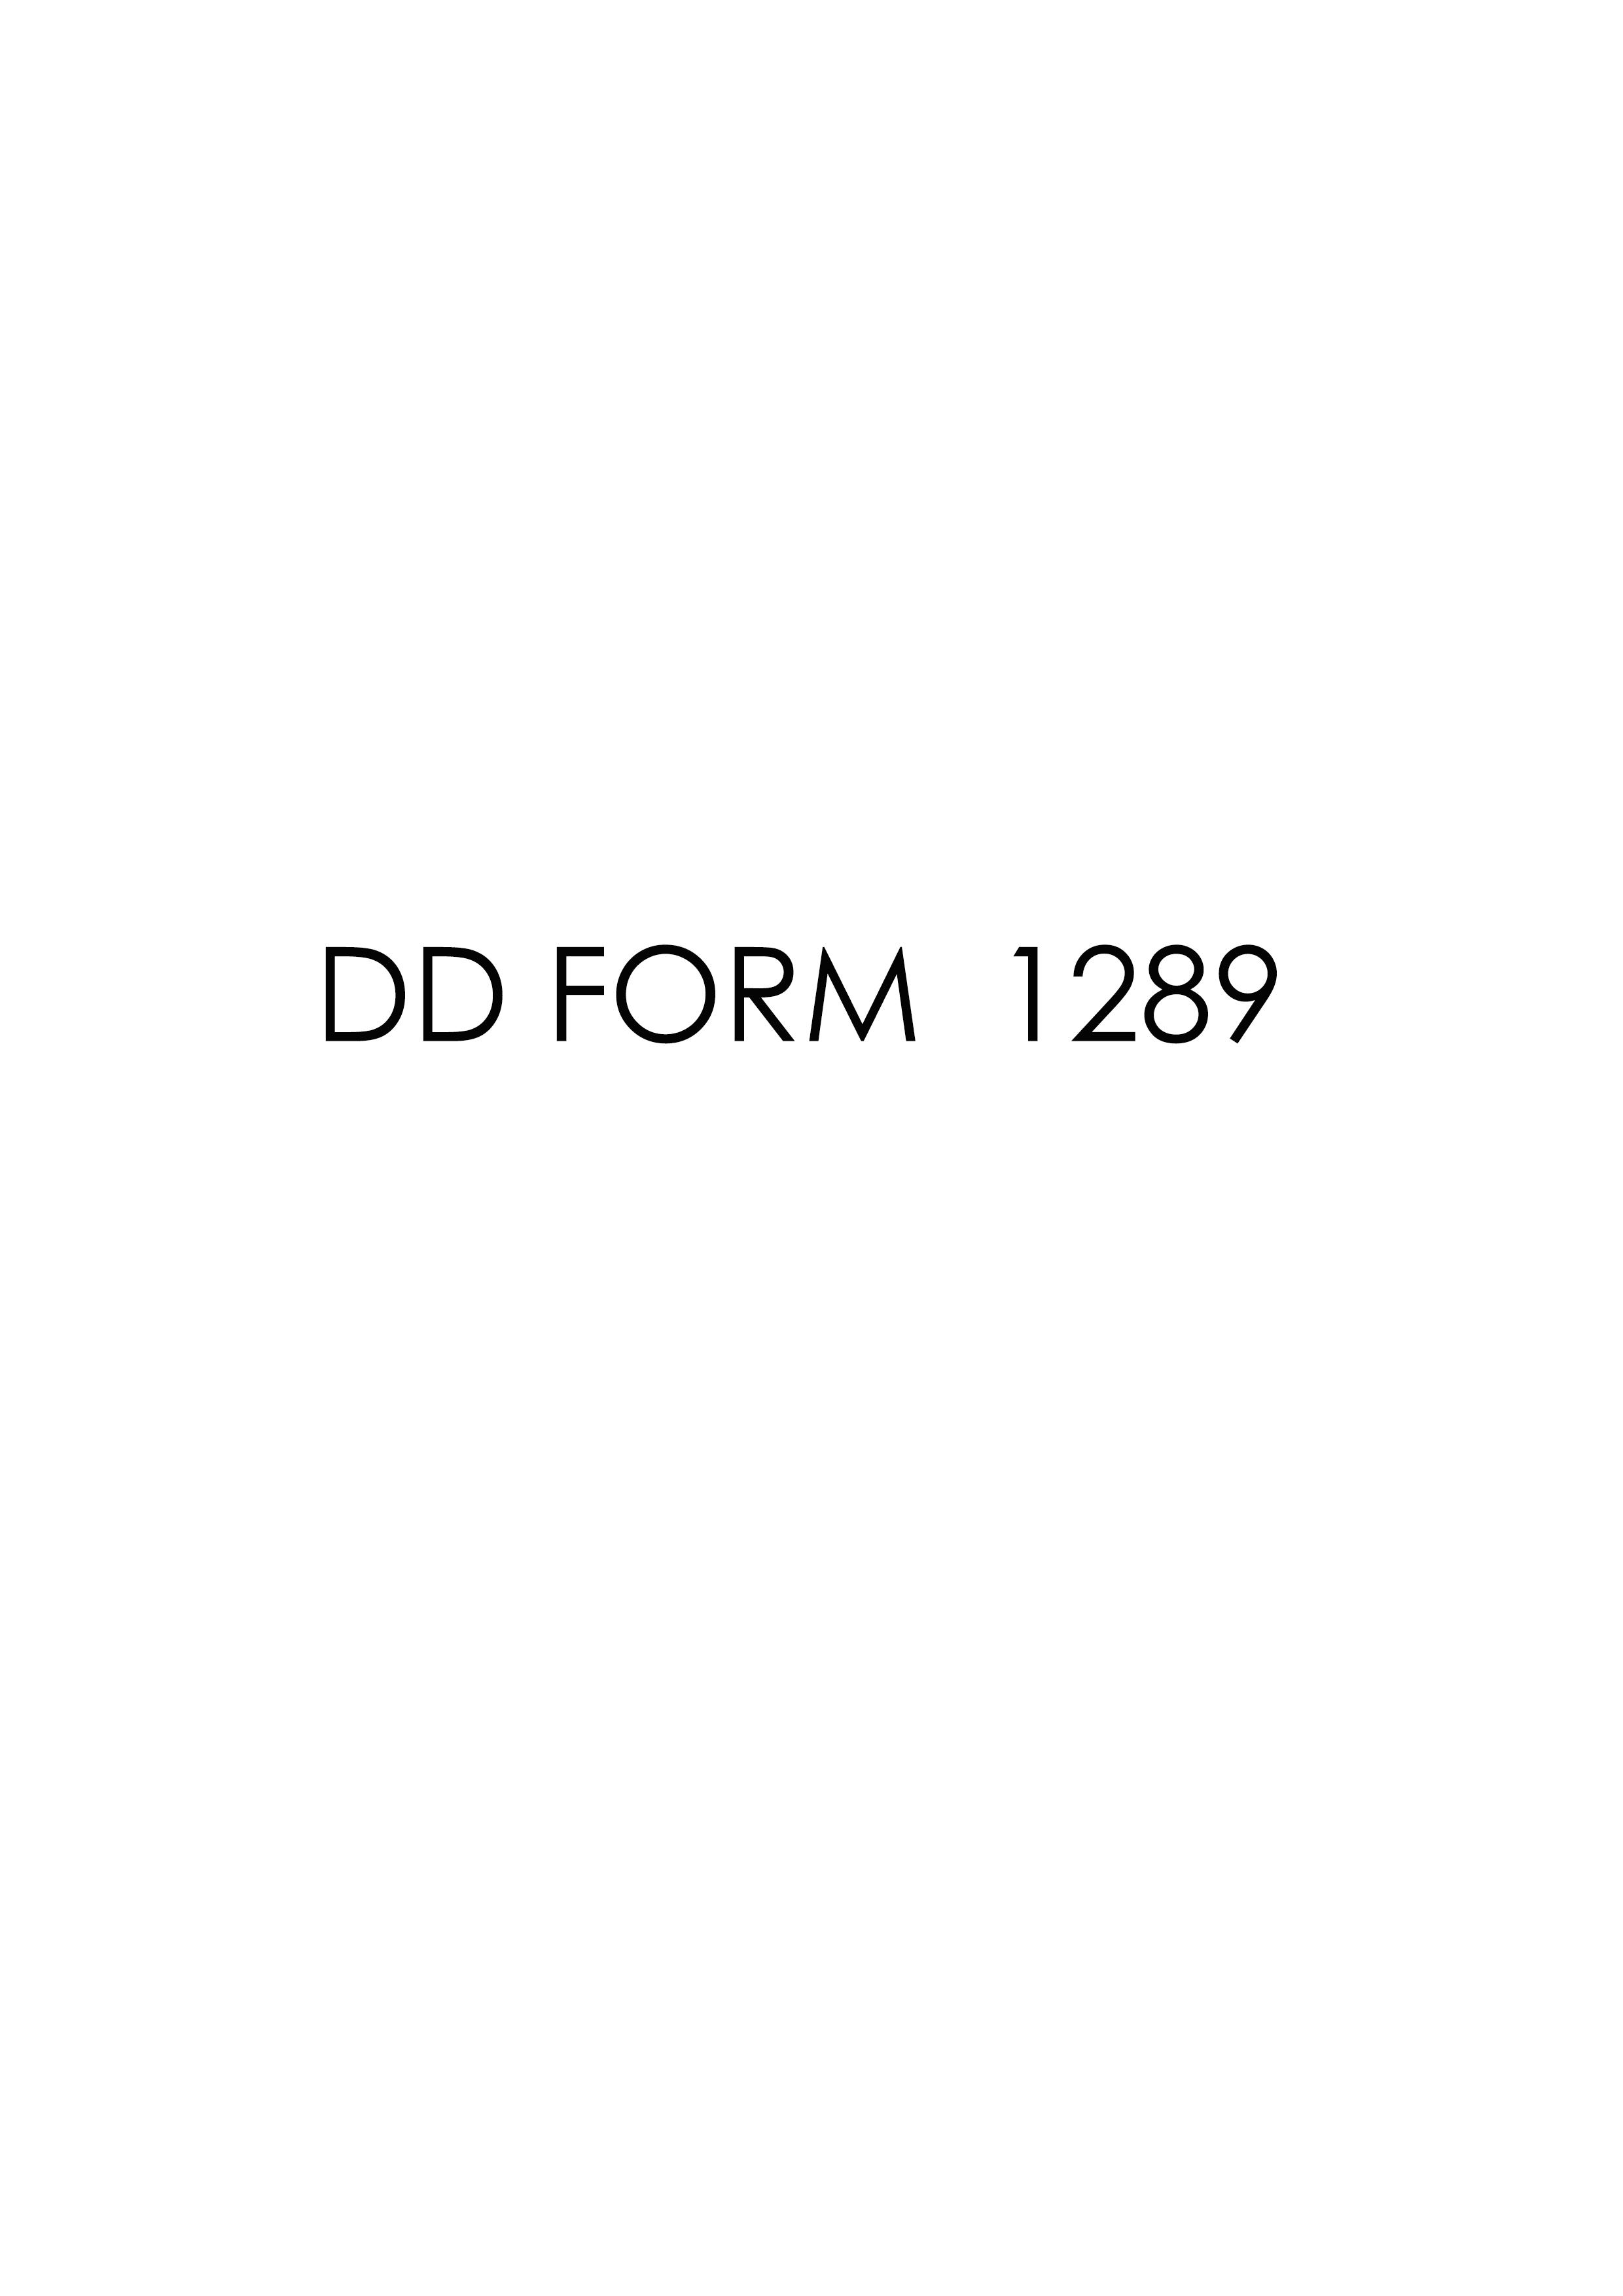 Download dd Form 1289 Free